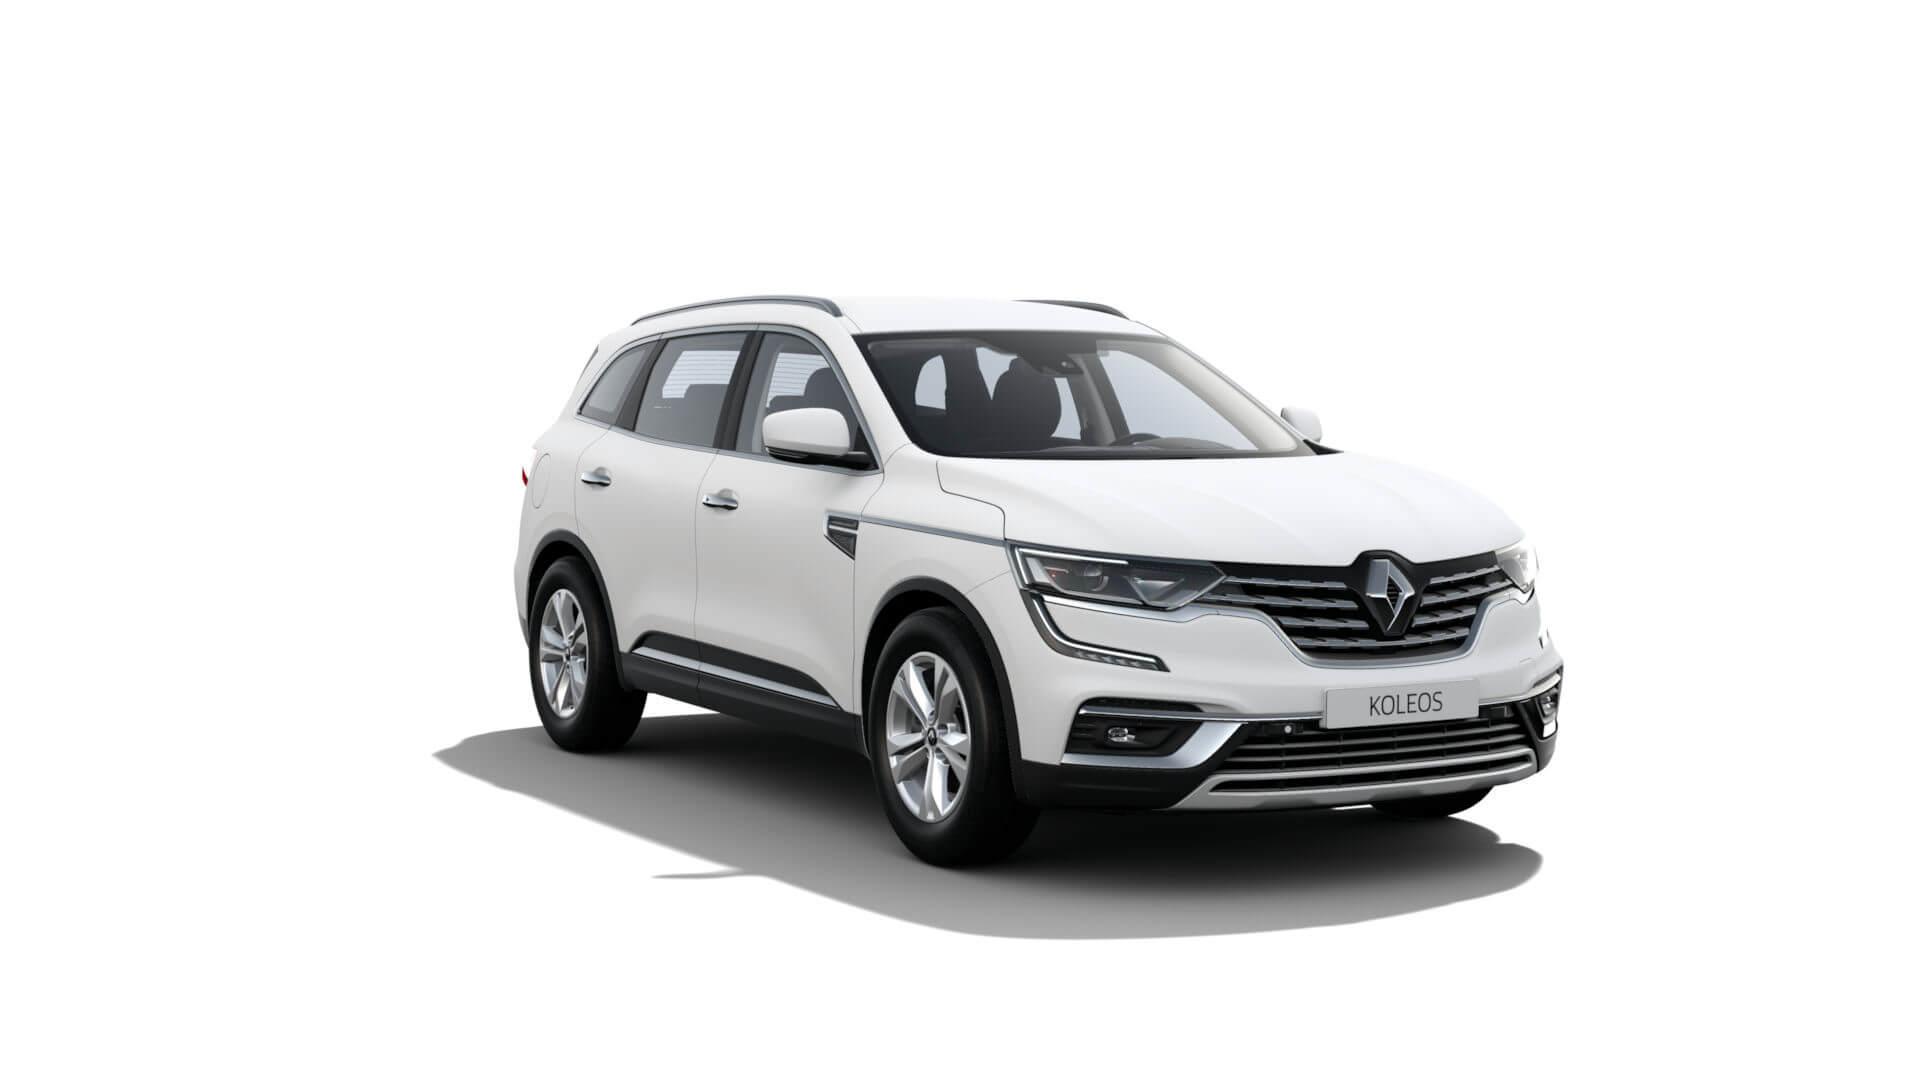 Automodell weiß - Renault Koleos - Renault Ahrens Hannover